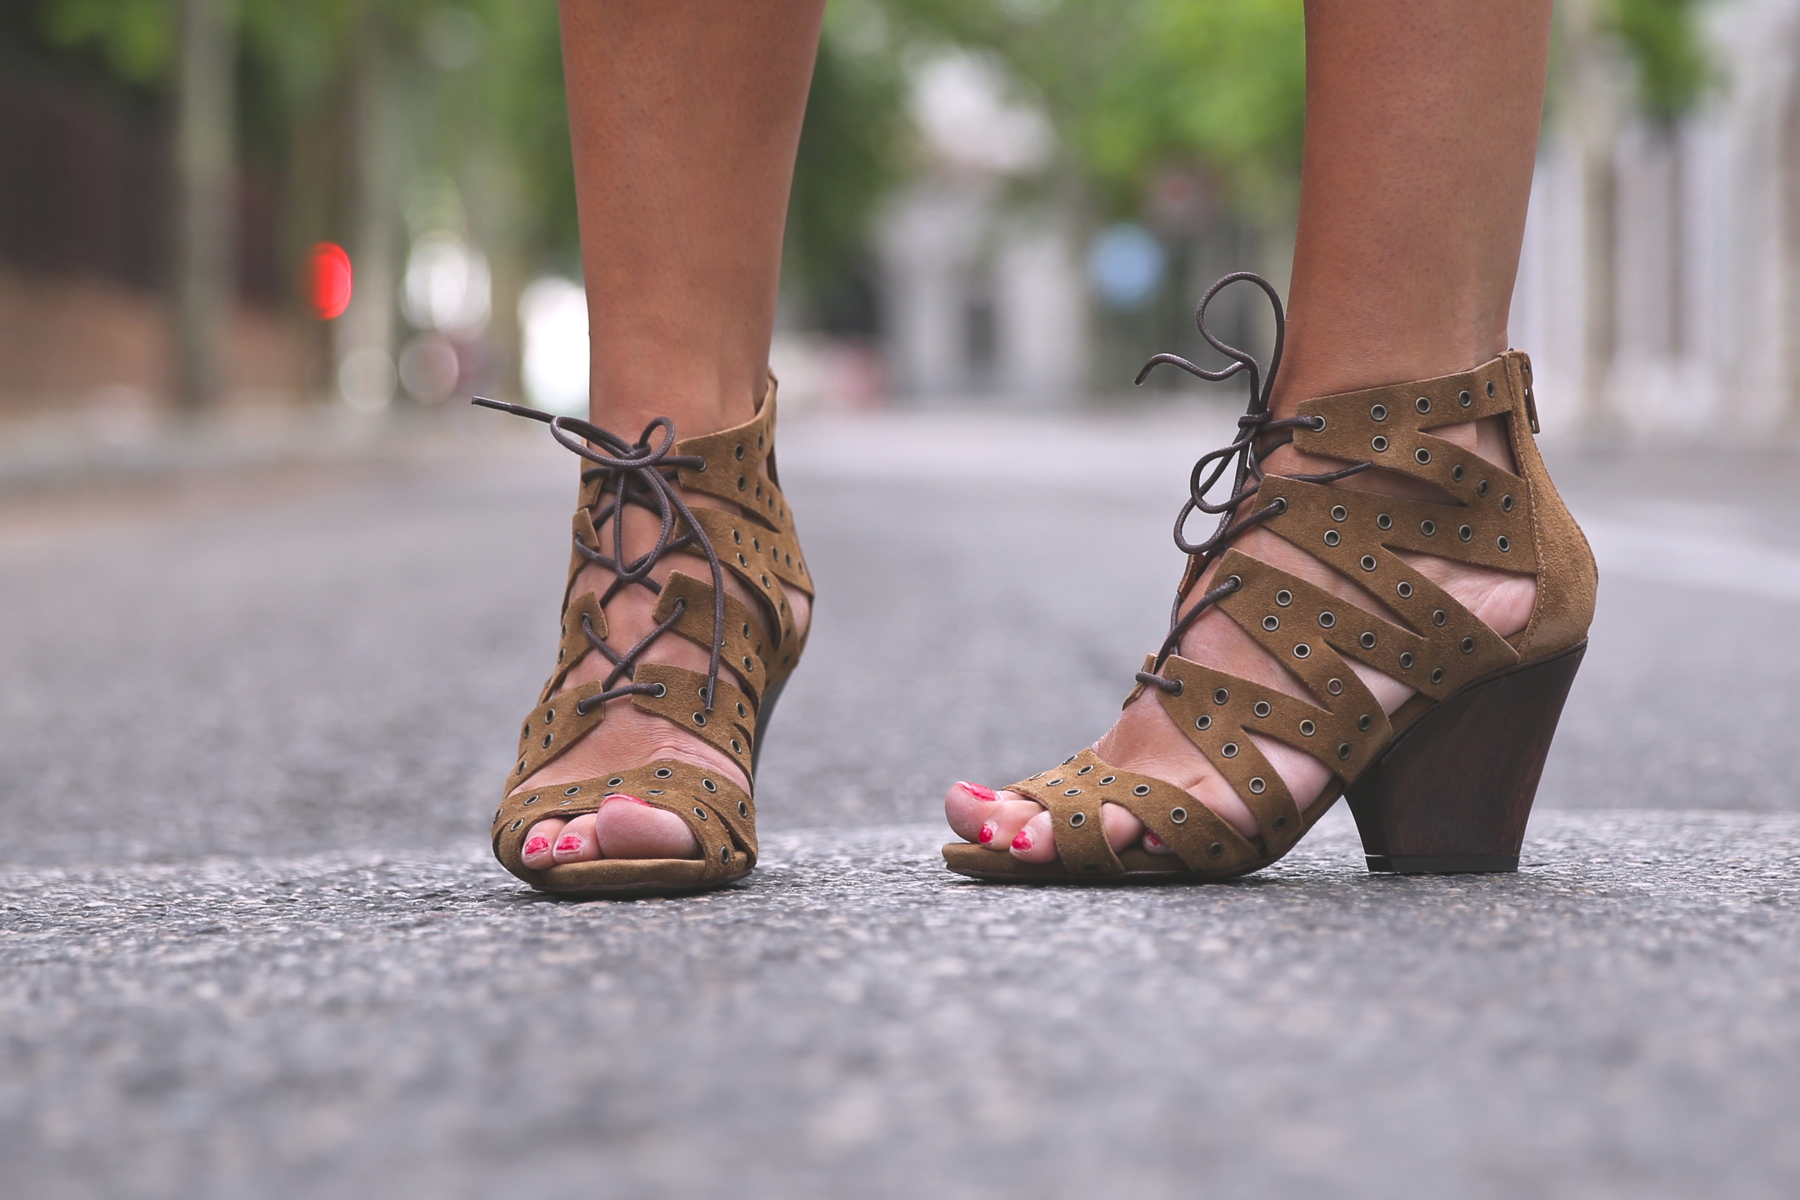 trendy_taste-look-outfit-street_style-ootd-blog-blogger-fashion_spain-moda_españa-denim_shorts-shorts_vaqueros-top_blanco-white_top-sandalias_cordones-ethnic_cluth-clutch_etnico-el_corte_ingles-1